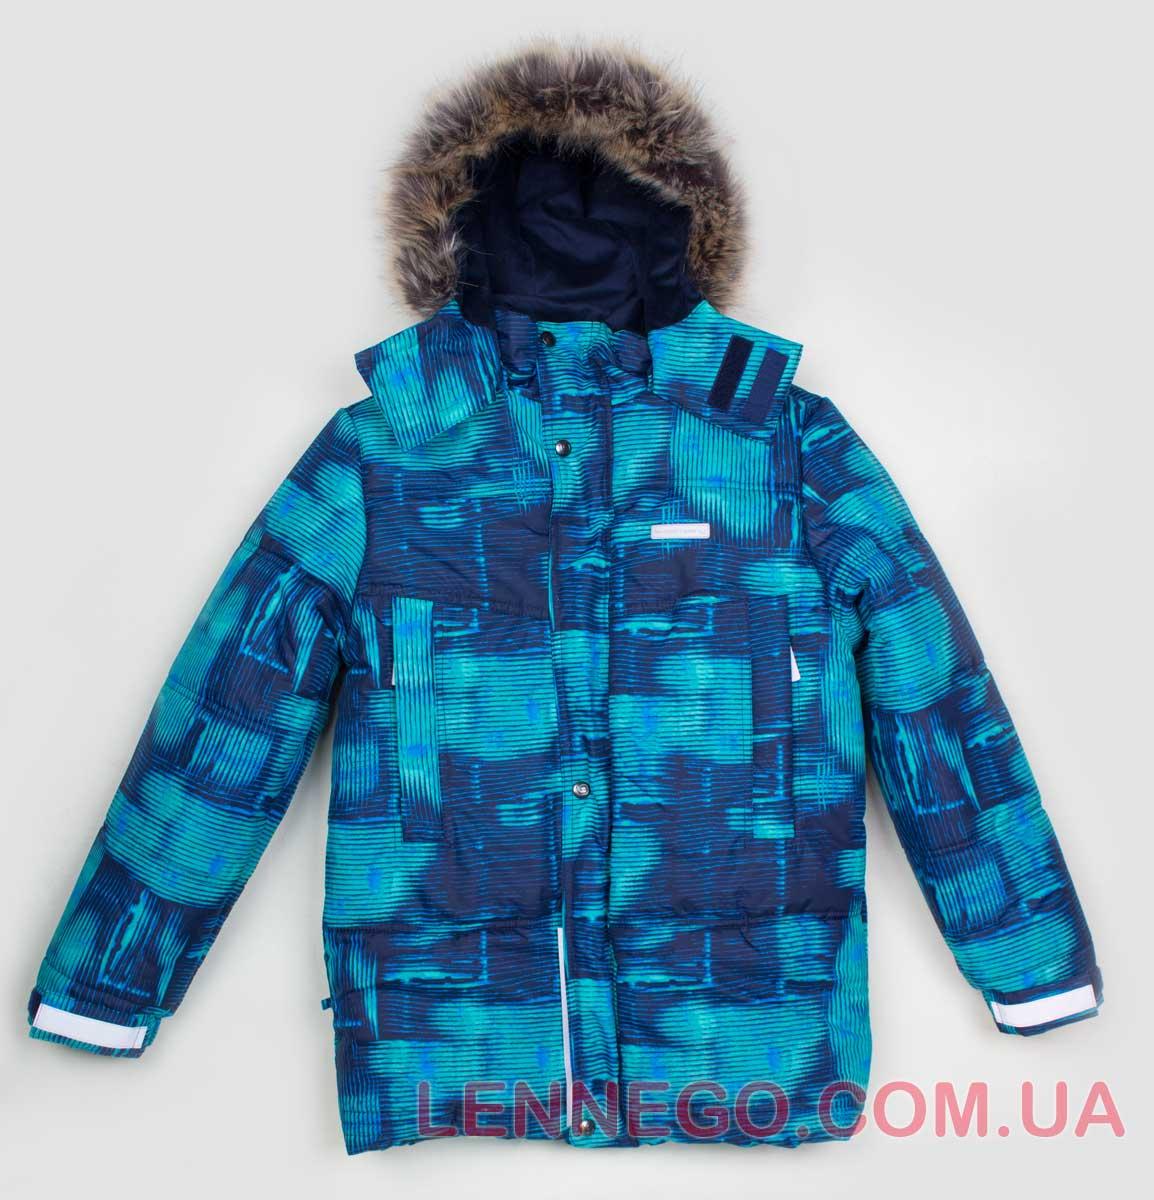 Lenne Sonny куртка для мальчика, зеленая подросток